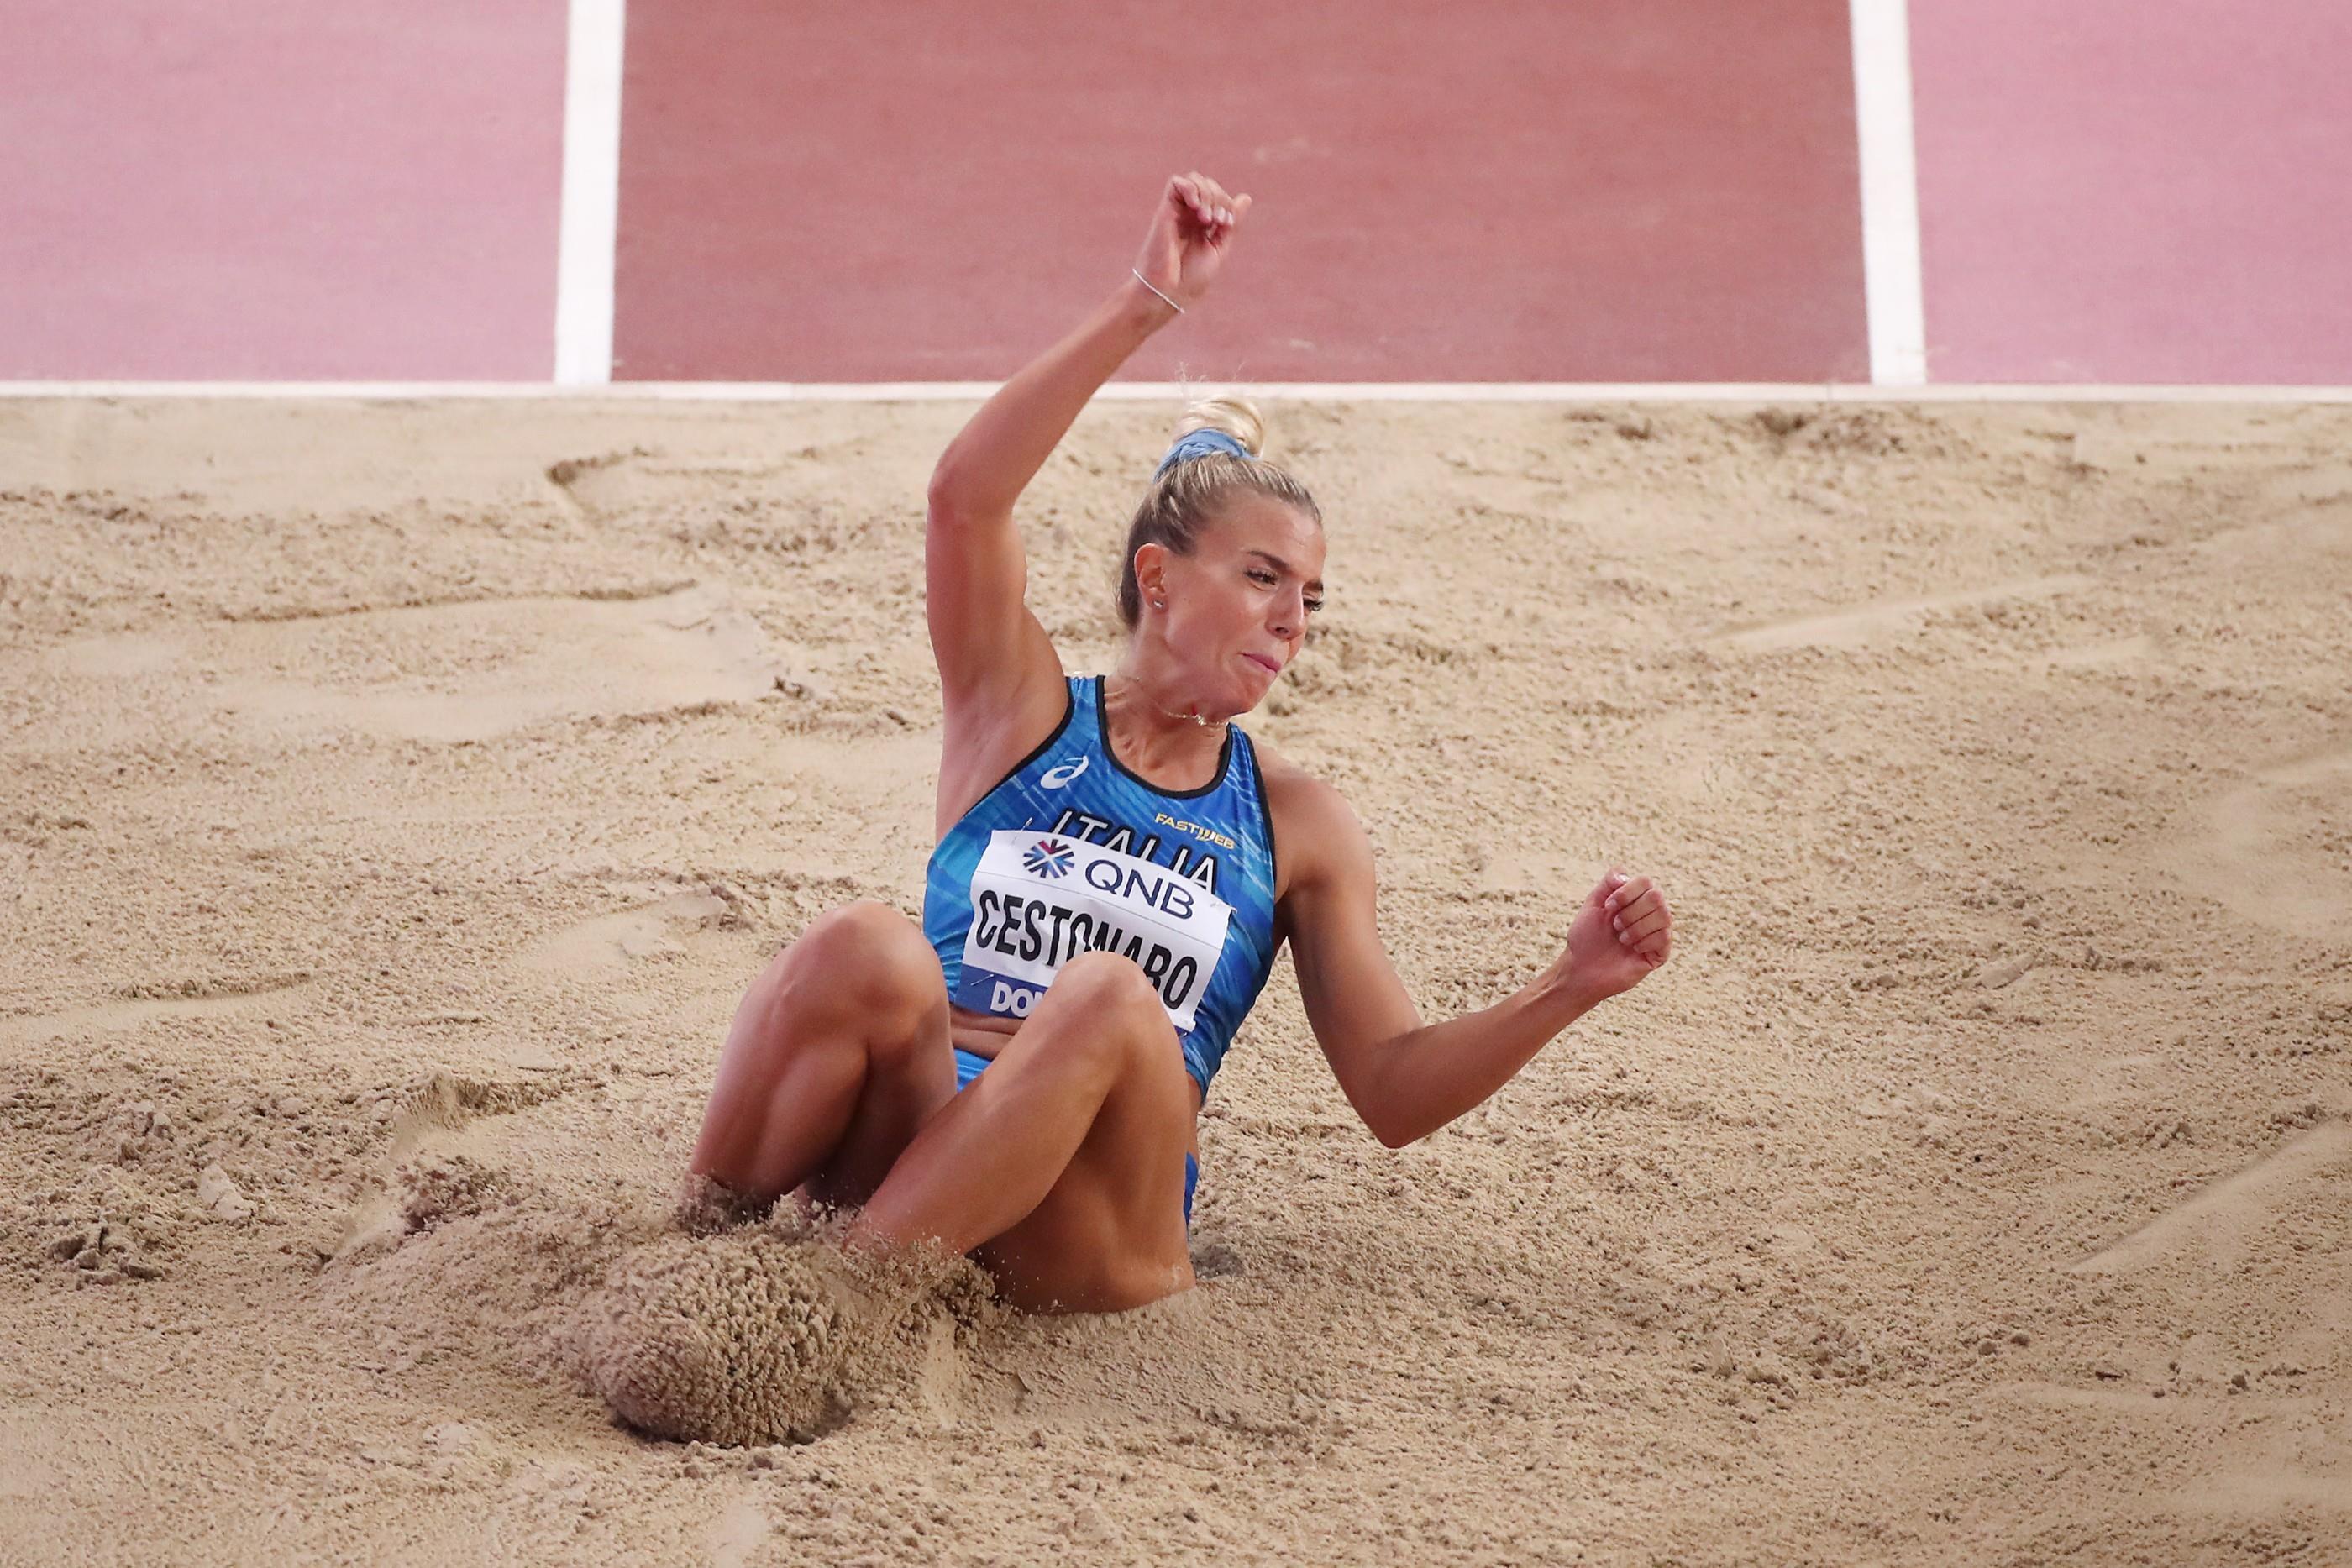 Ottavia Cestonaro (Getty Images)